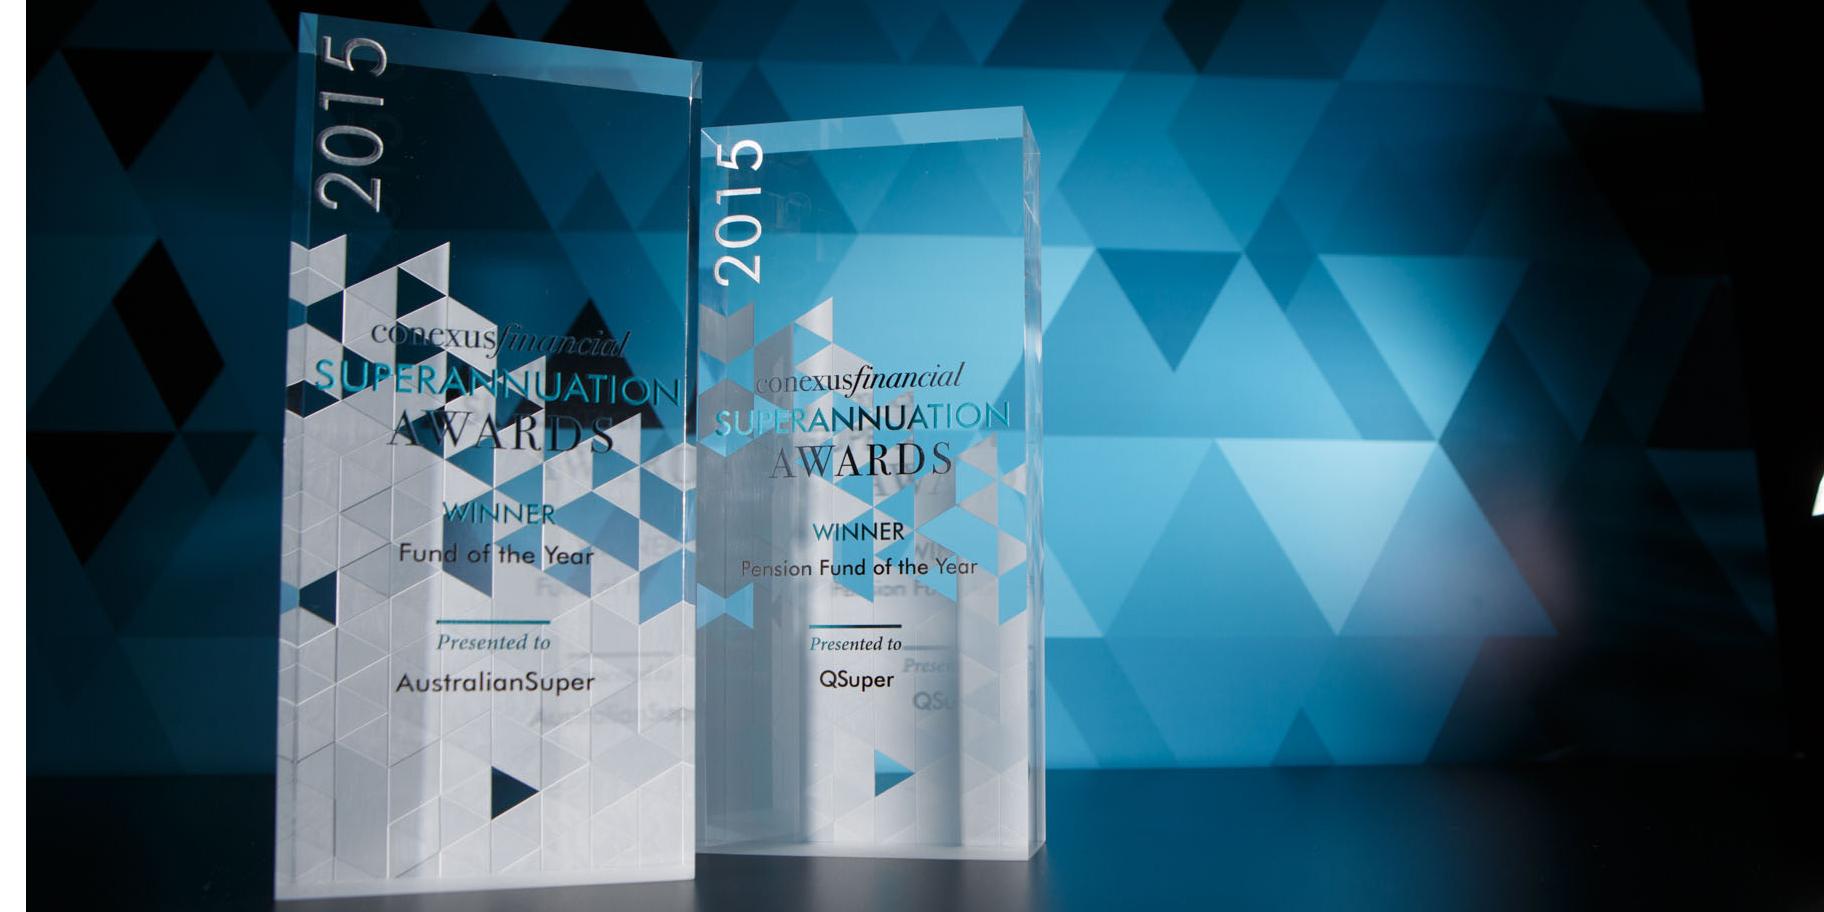 awardspic (2)